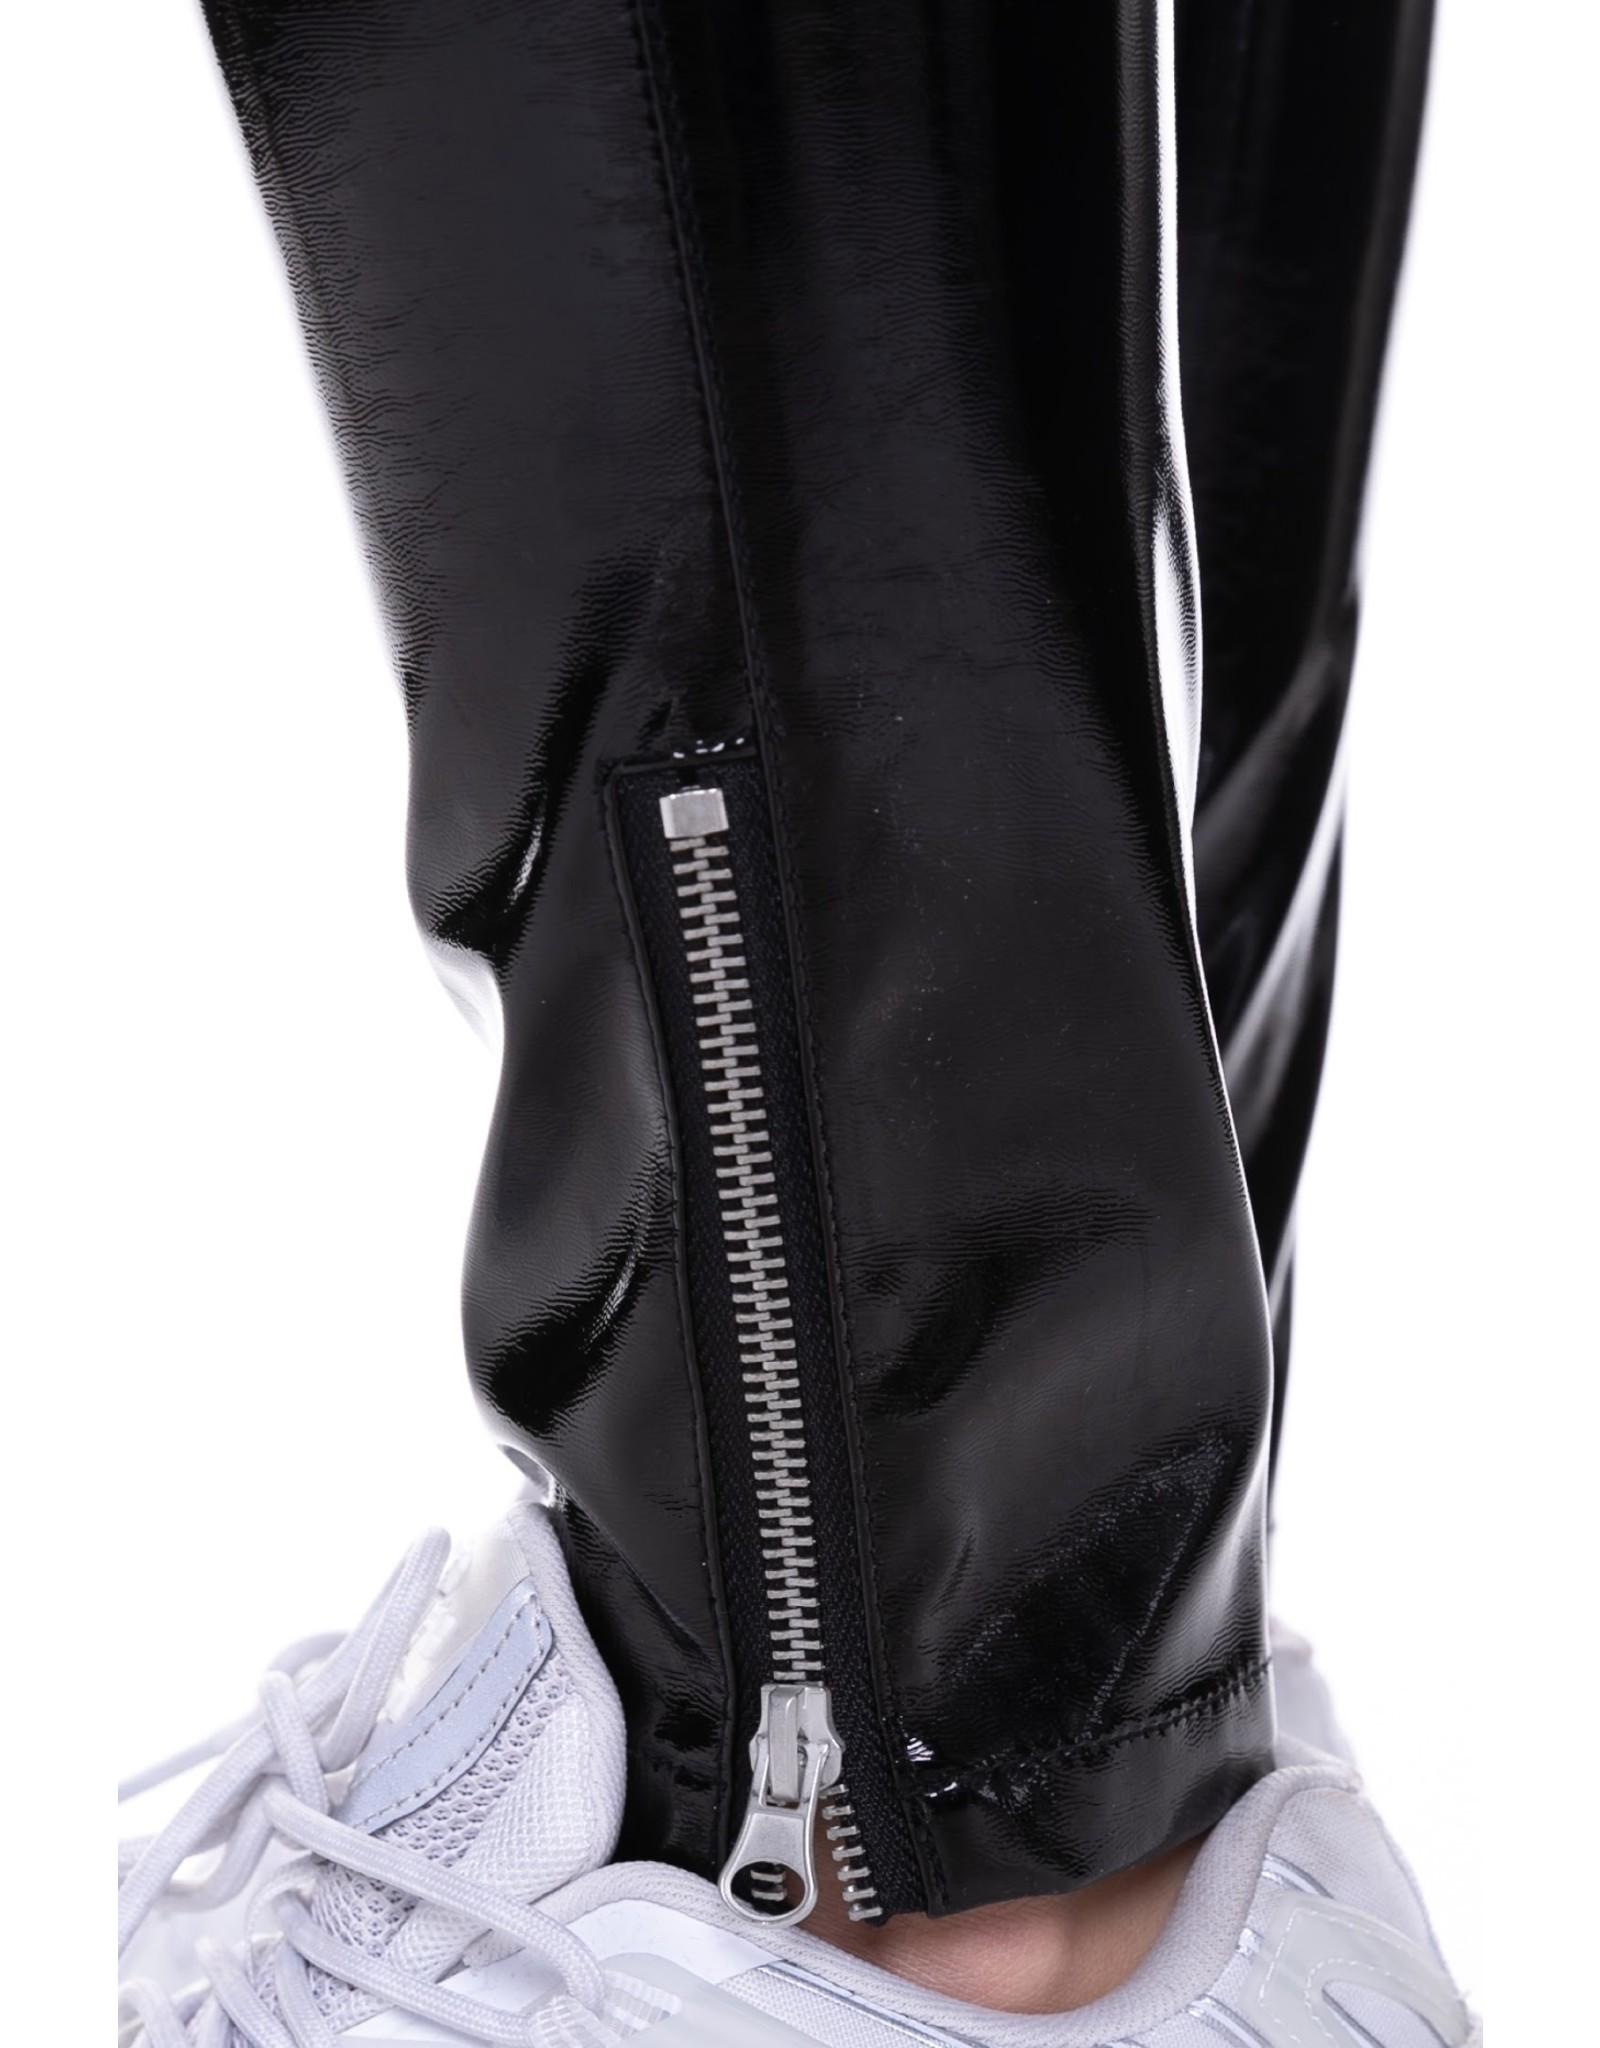 CR Rox PU Pants Black